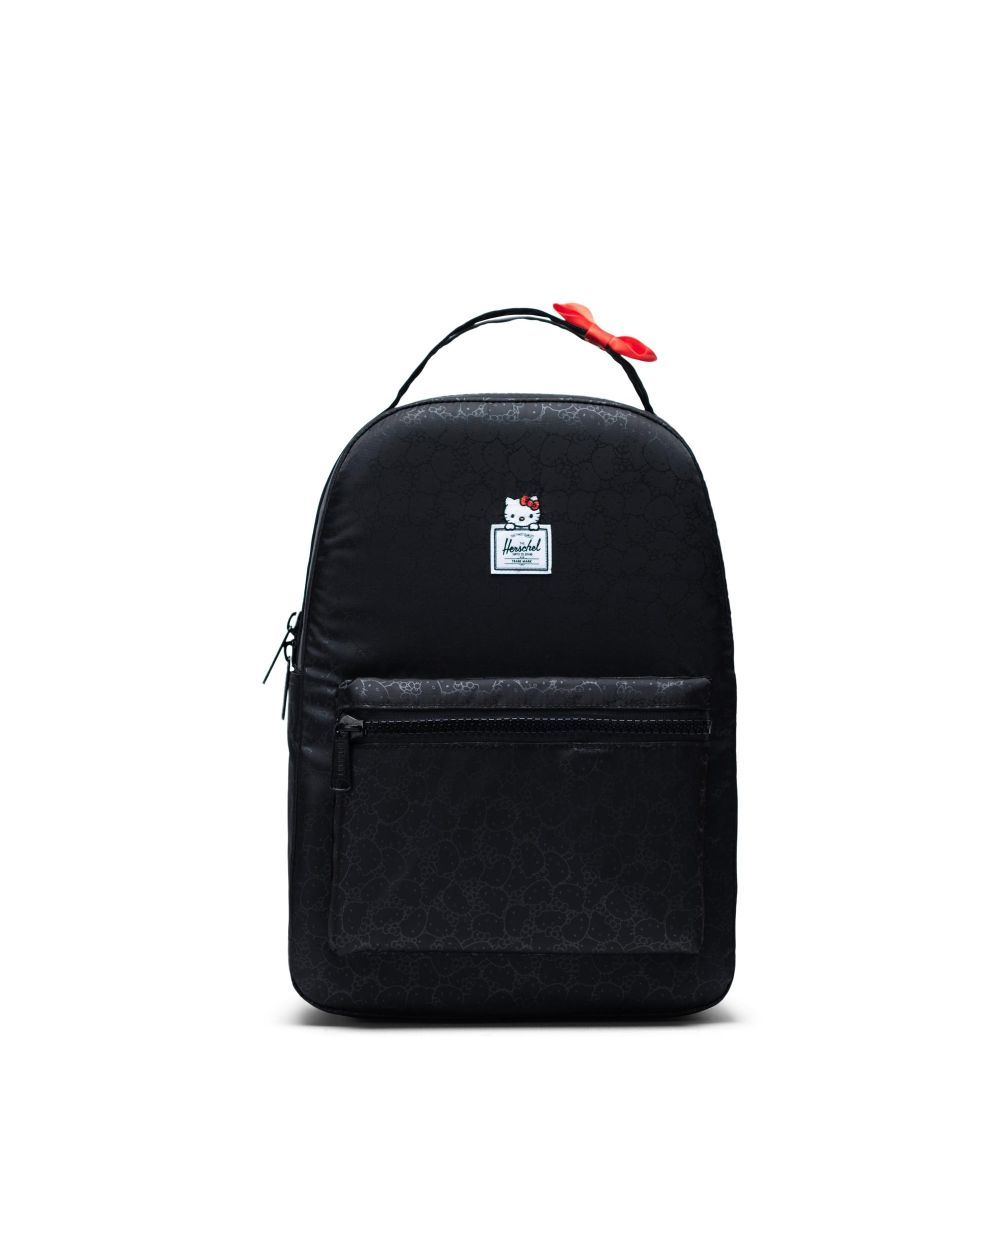 9fc547619 Nova Backpack Mid-Volume Hello Kitty | Herschel Supply Company ...